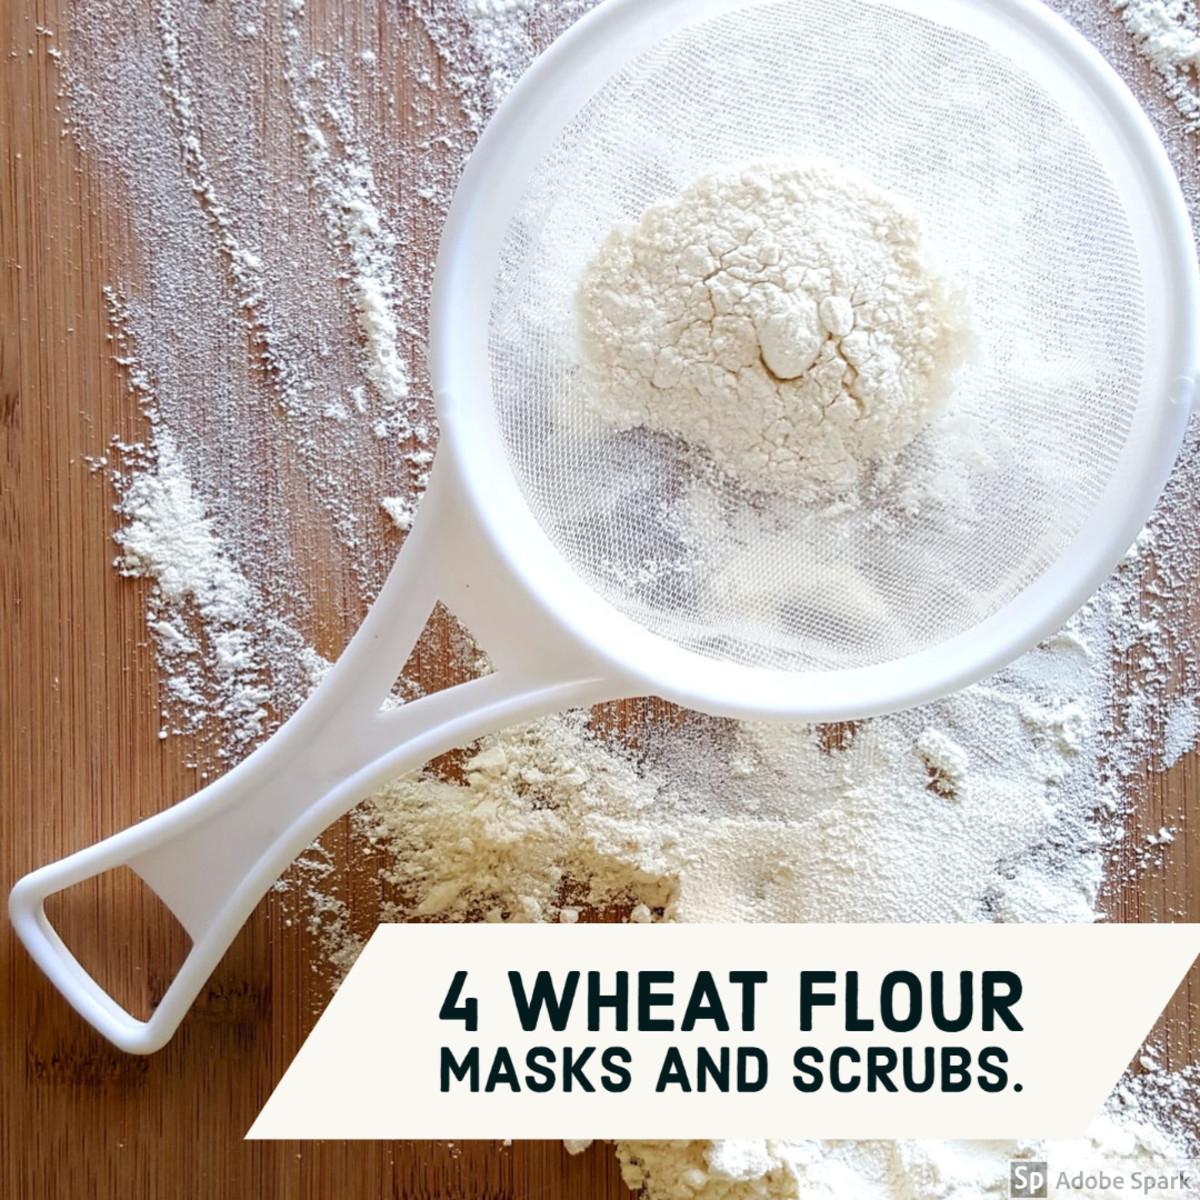 4-beneficial-diy-wheat-flour-masks-and-scrubs